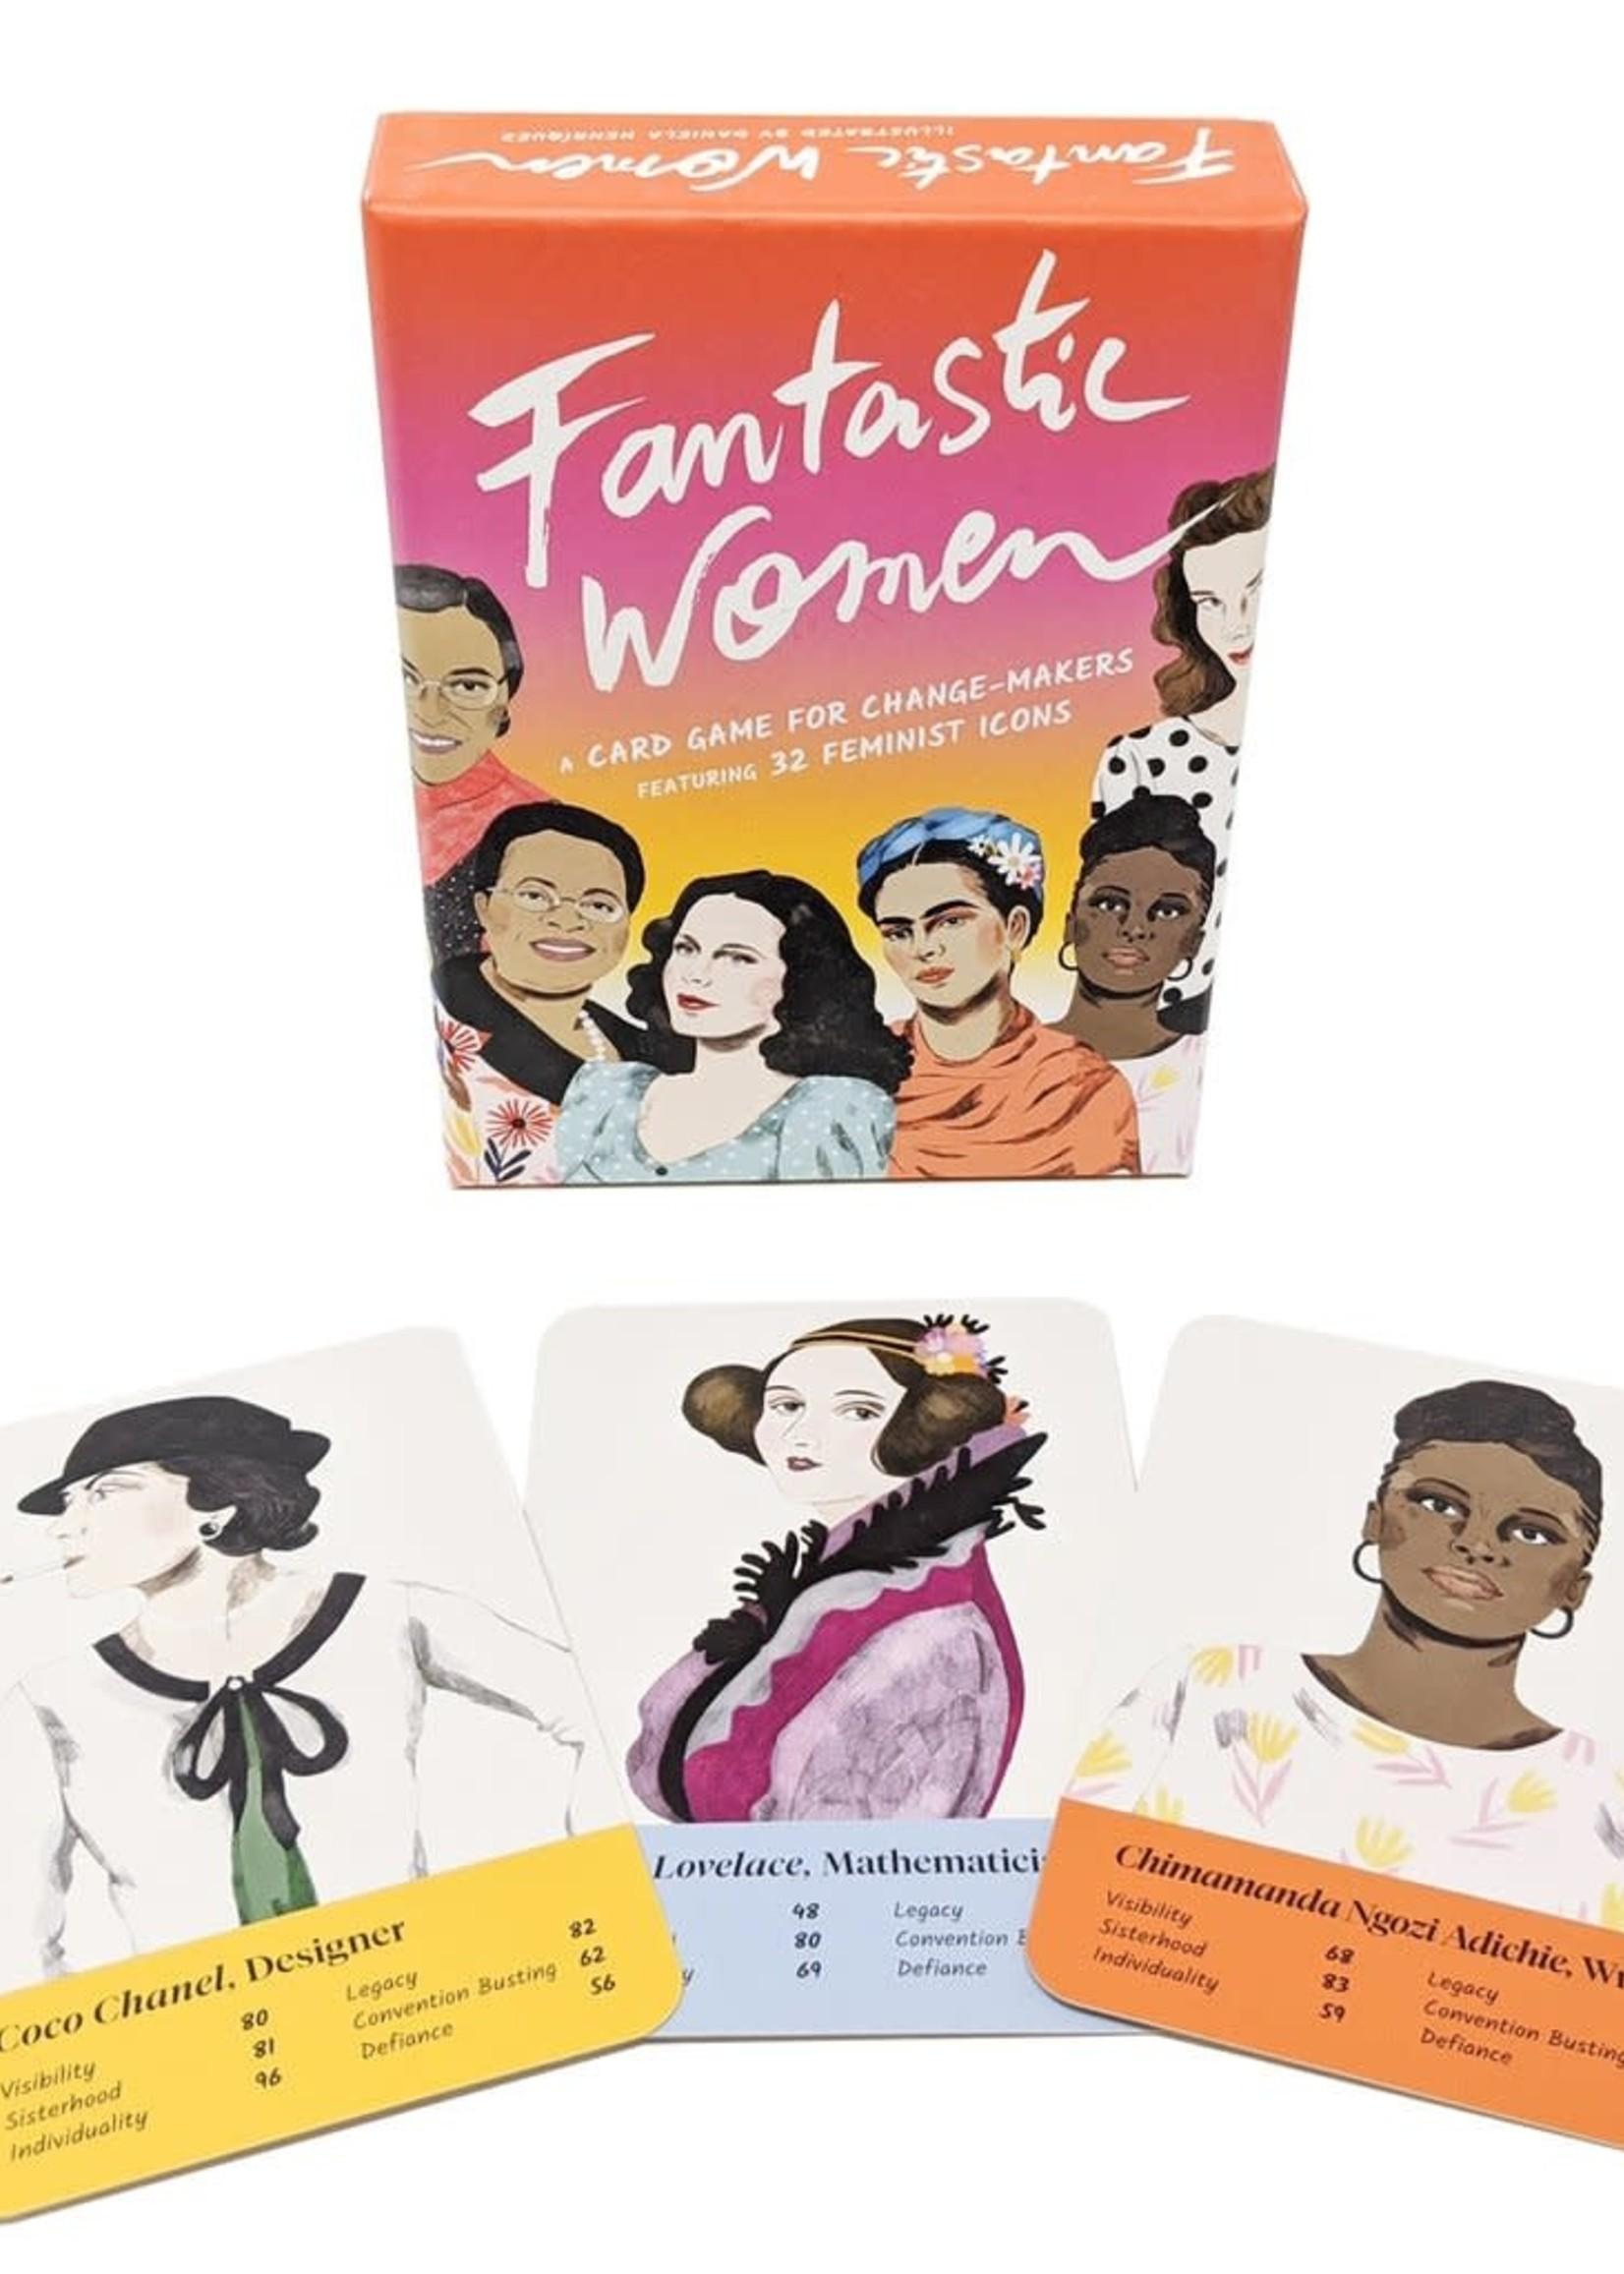 HACHETTE FANTASTIC WOMEN CARD GAME